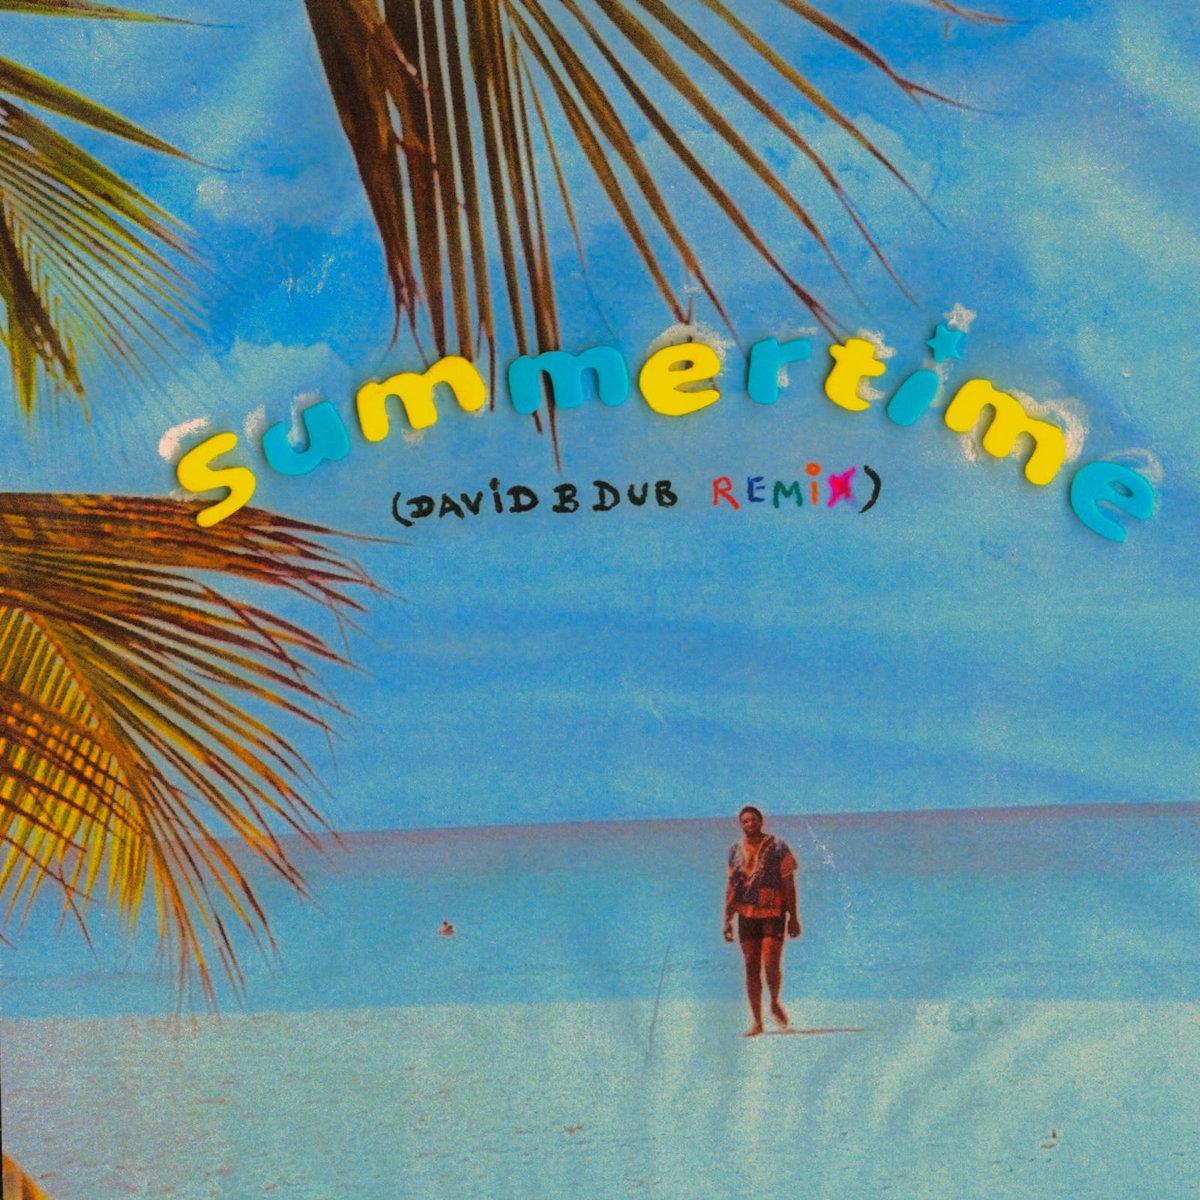 Ibn Itaka David B Dub Remix «Summertime» (2019)